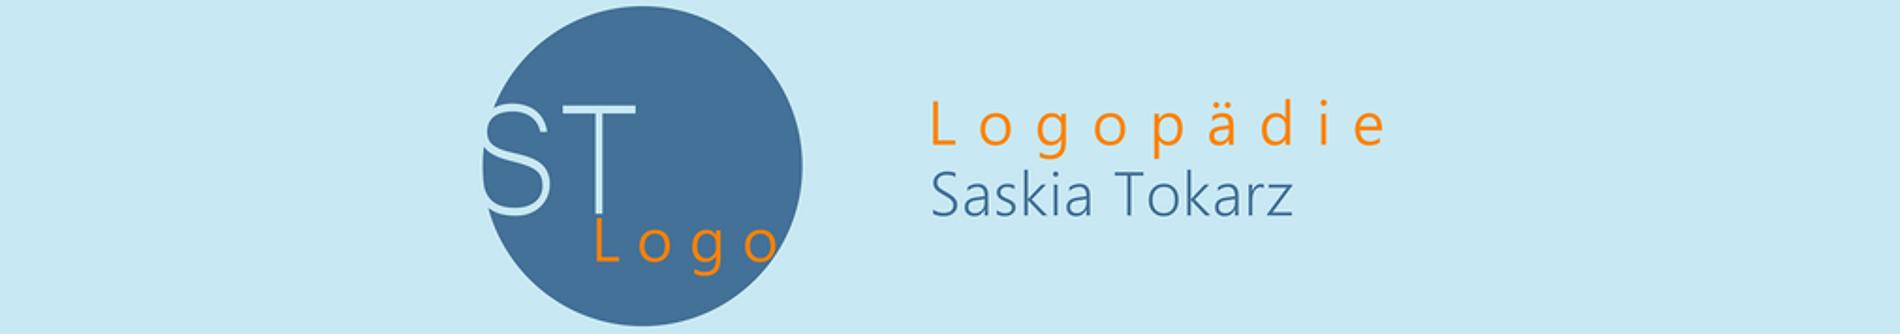 Logopädie Saskia Tokarz, Logopädie Stuttgart Mitte, Logopädie Stuttgart West, Sprachtherapie, Stimmtherapie, CI, Laryngektomie, Parkinson, Sprachförerung